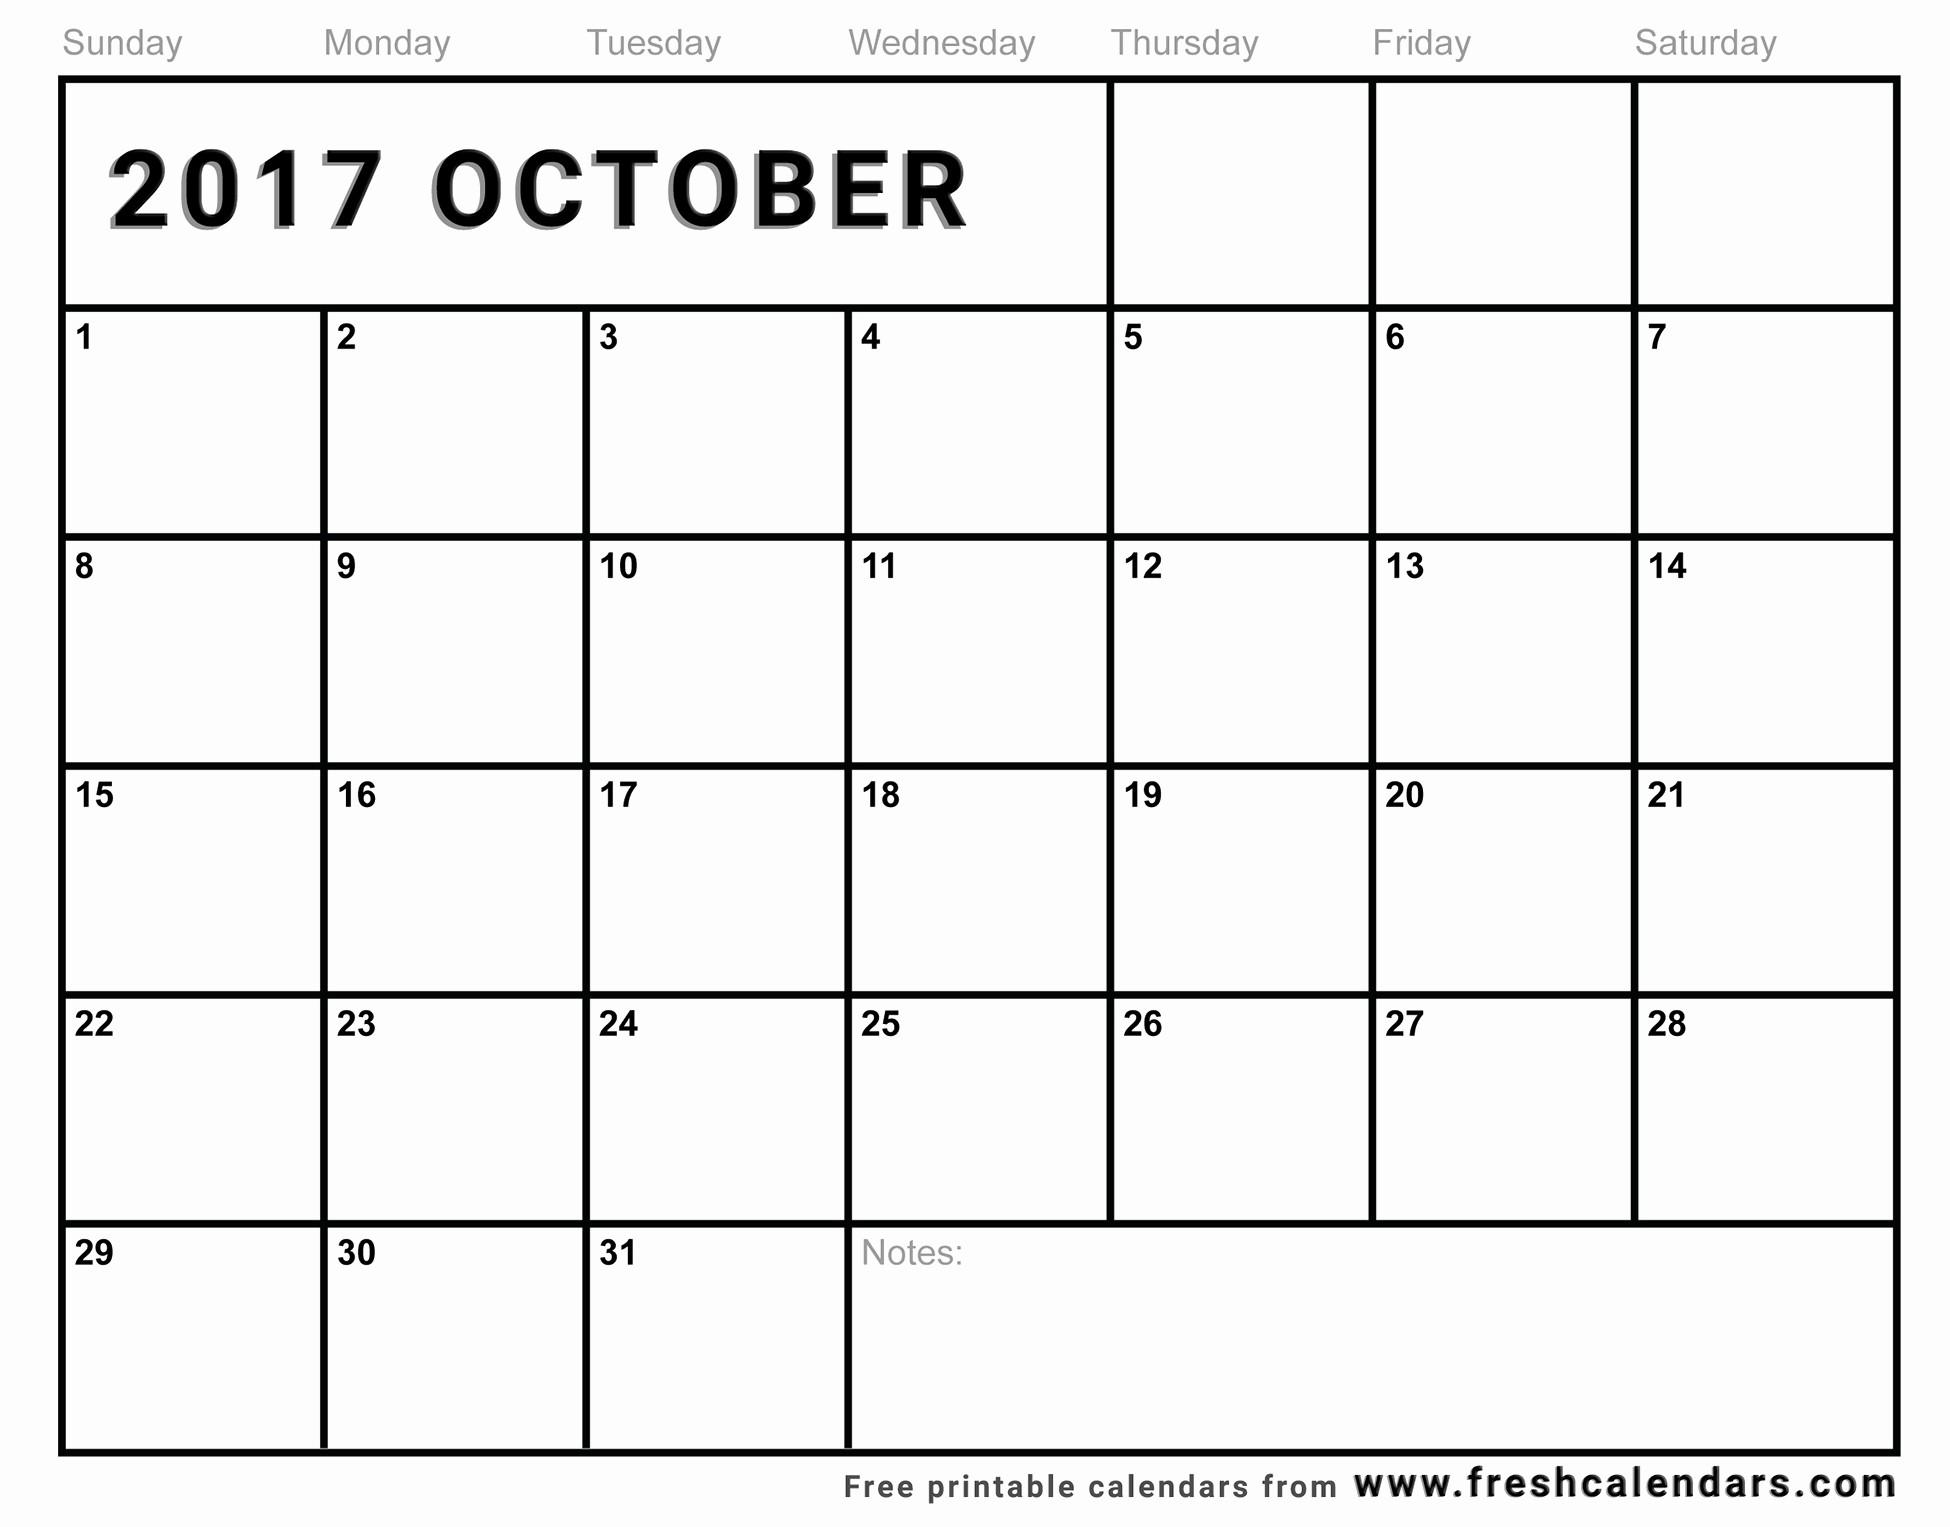 Free Printable Monthly 2017 Calendar New Blank October 2017 Calendar Printable Templates